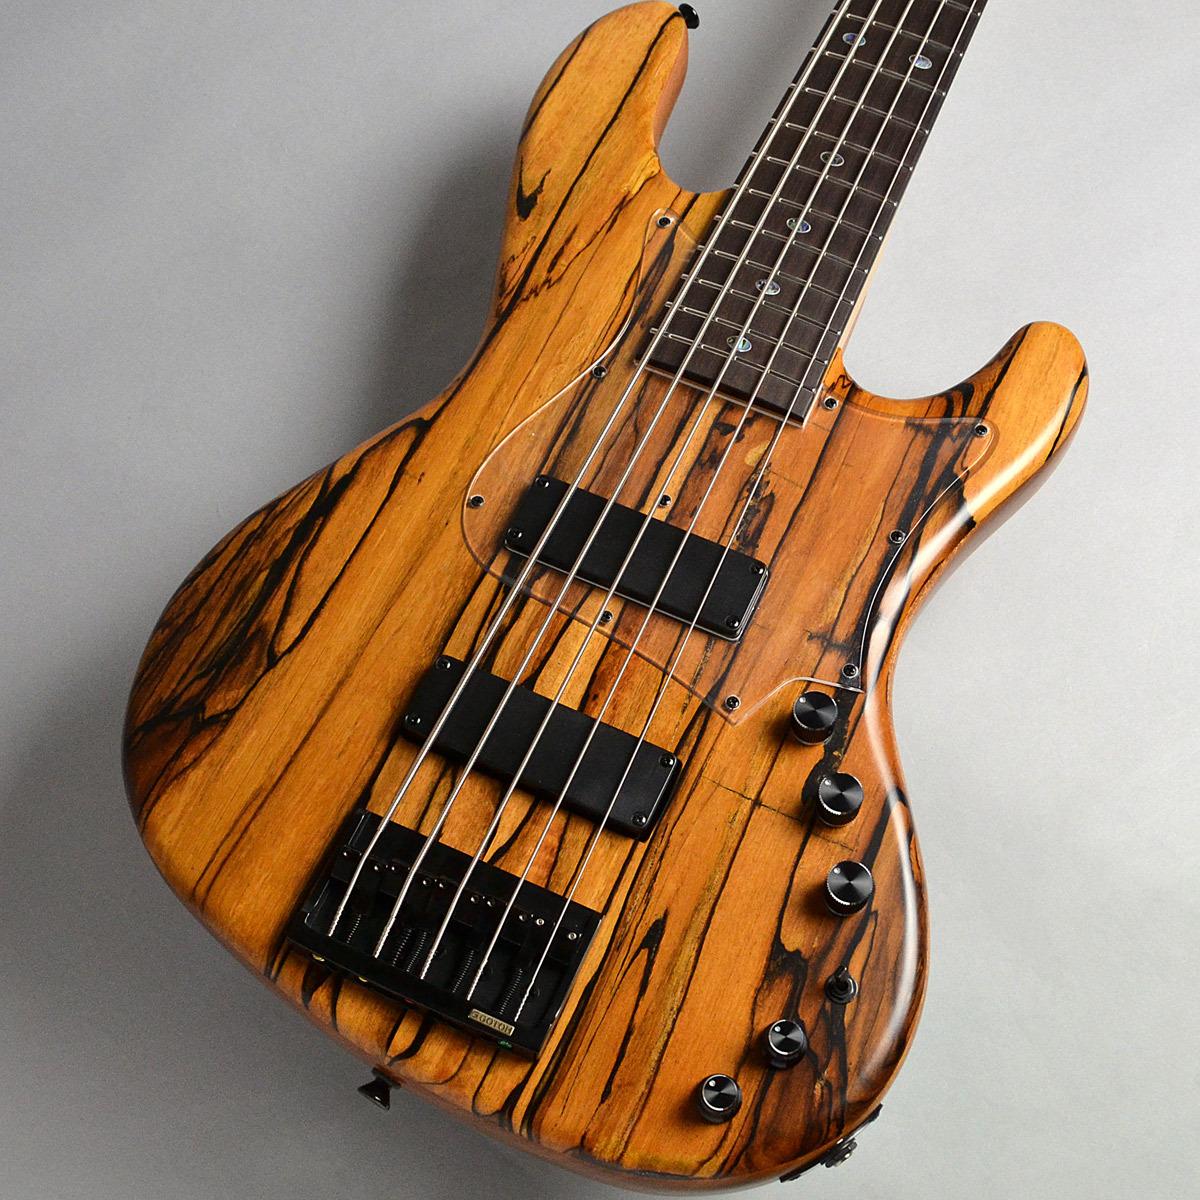 Freedom Custom Guitar Research RHINO 5st Mahogany/R Black&White Ebony Top エレキベース(5弦) 【フリーダム】【新宿PePe店】【楽器フェア2018展示モデル】